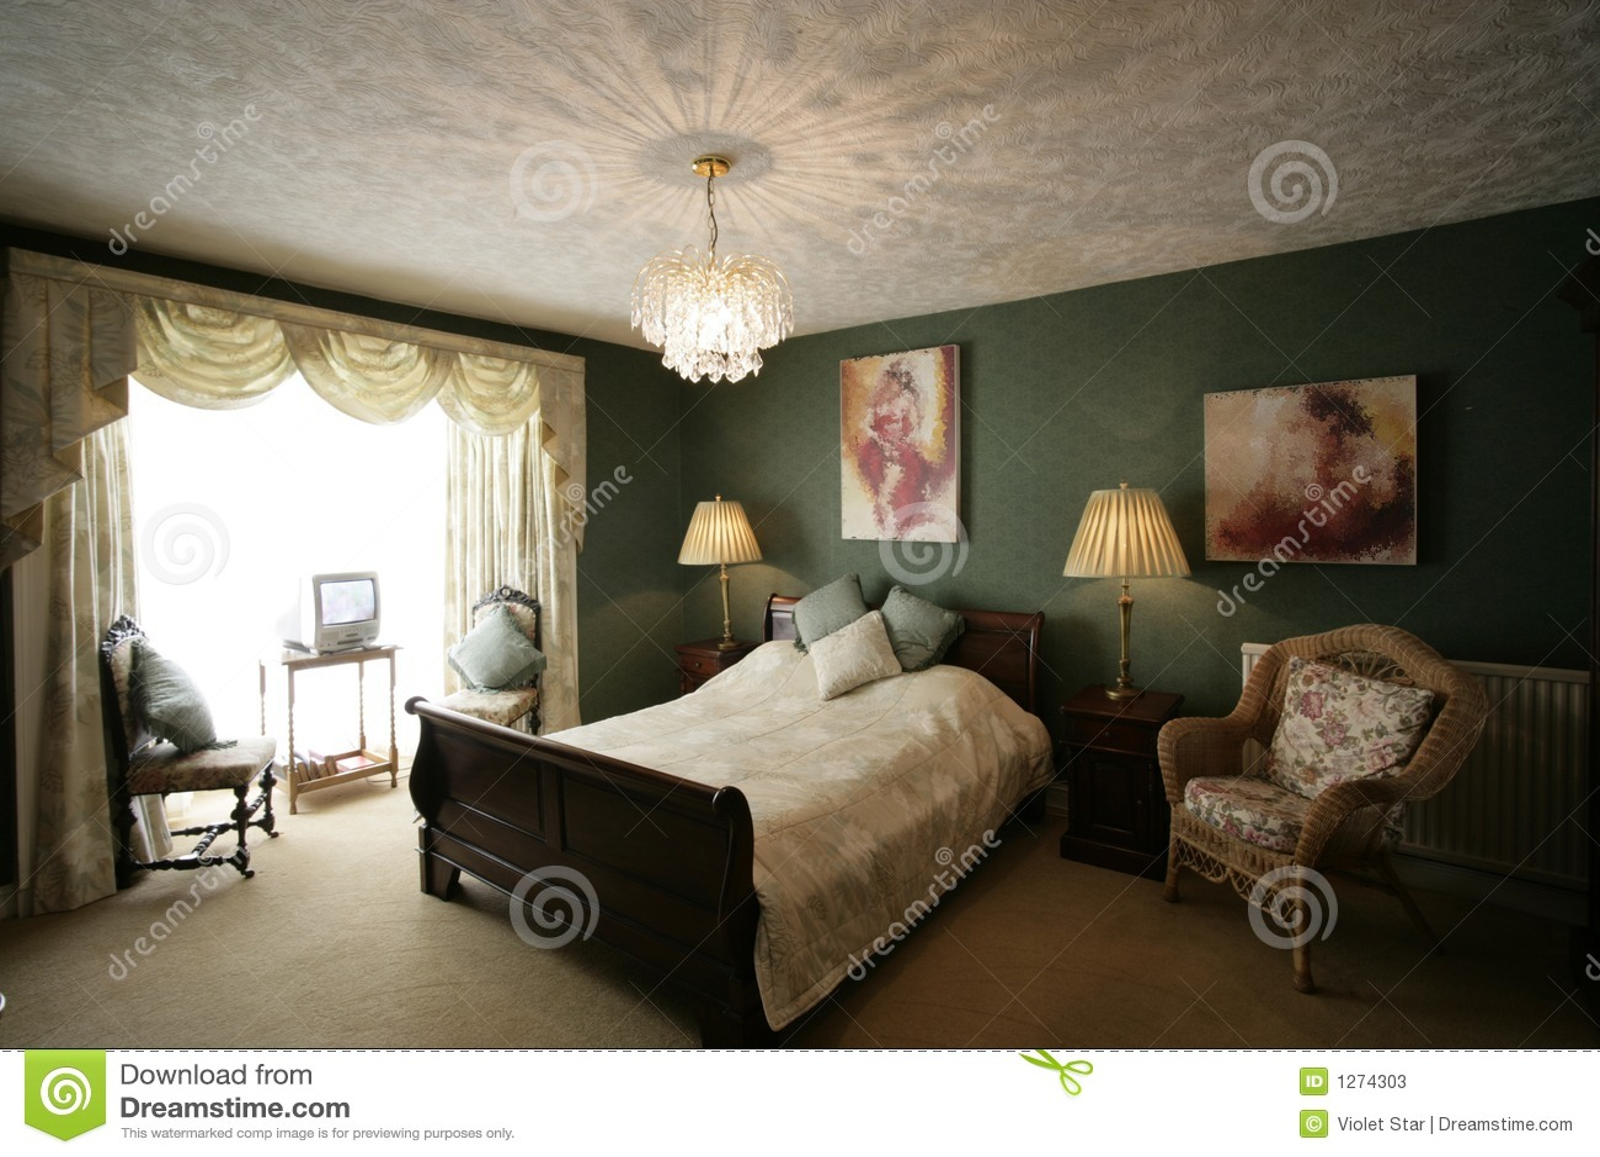 Meisje romantische stijl slaapkamer maison design naxza